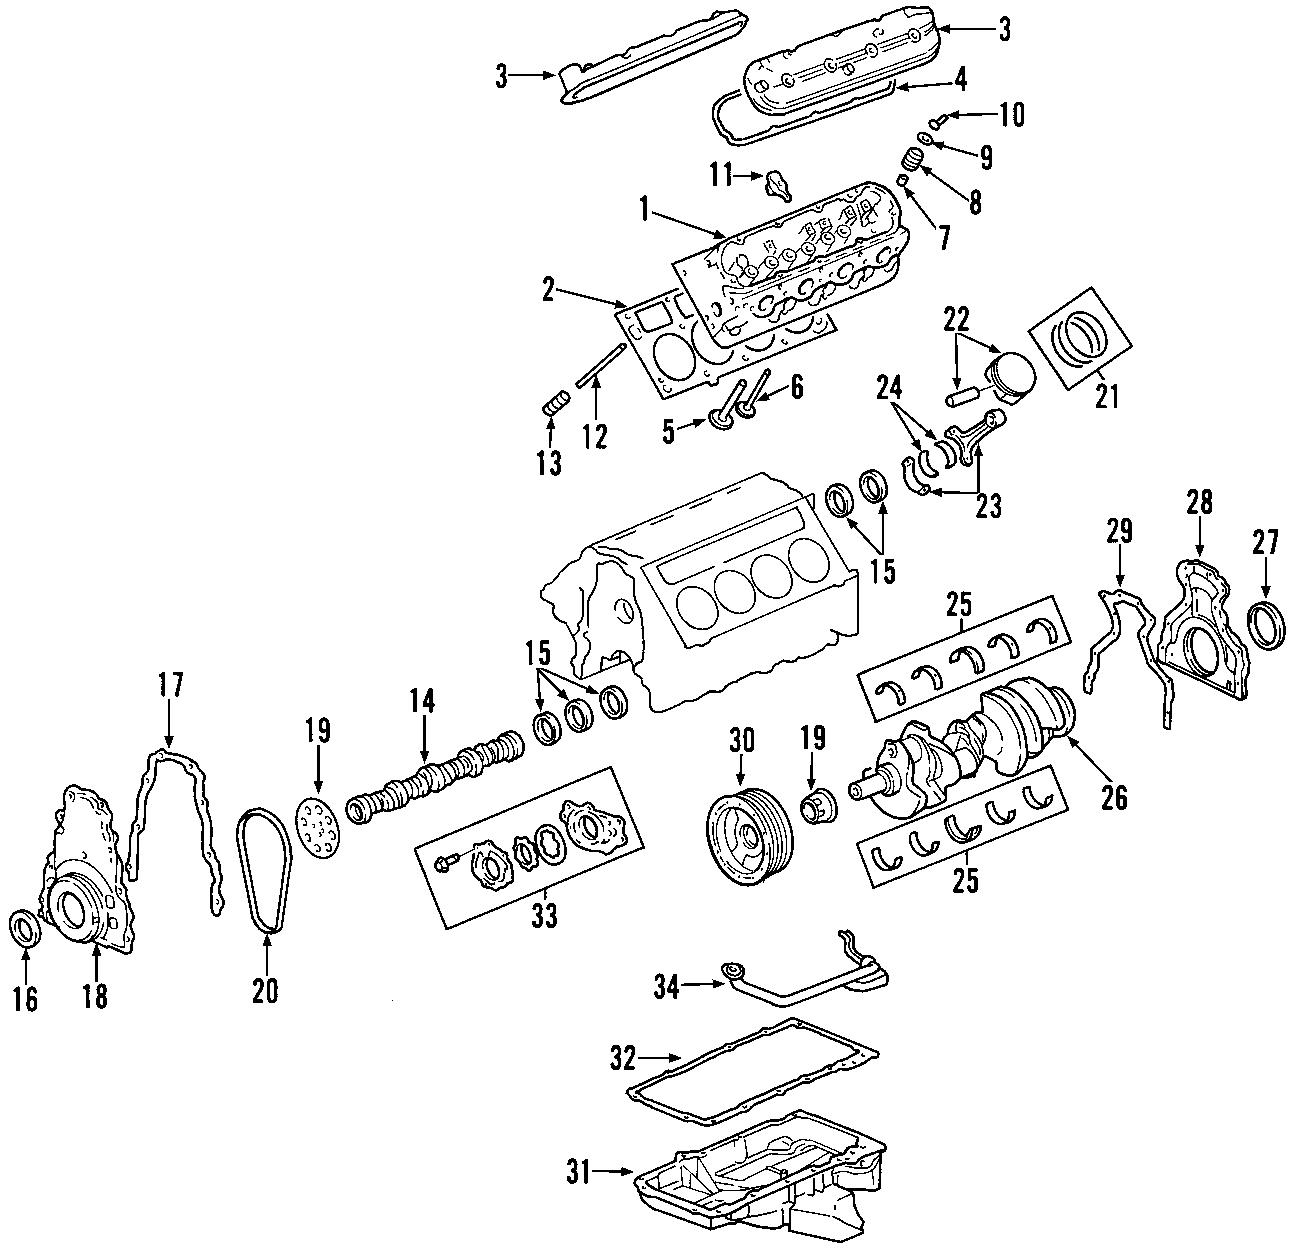 Hummer H3T Engine Camshaft Bearing. Models, Silverado